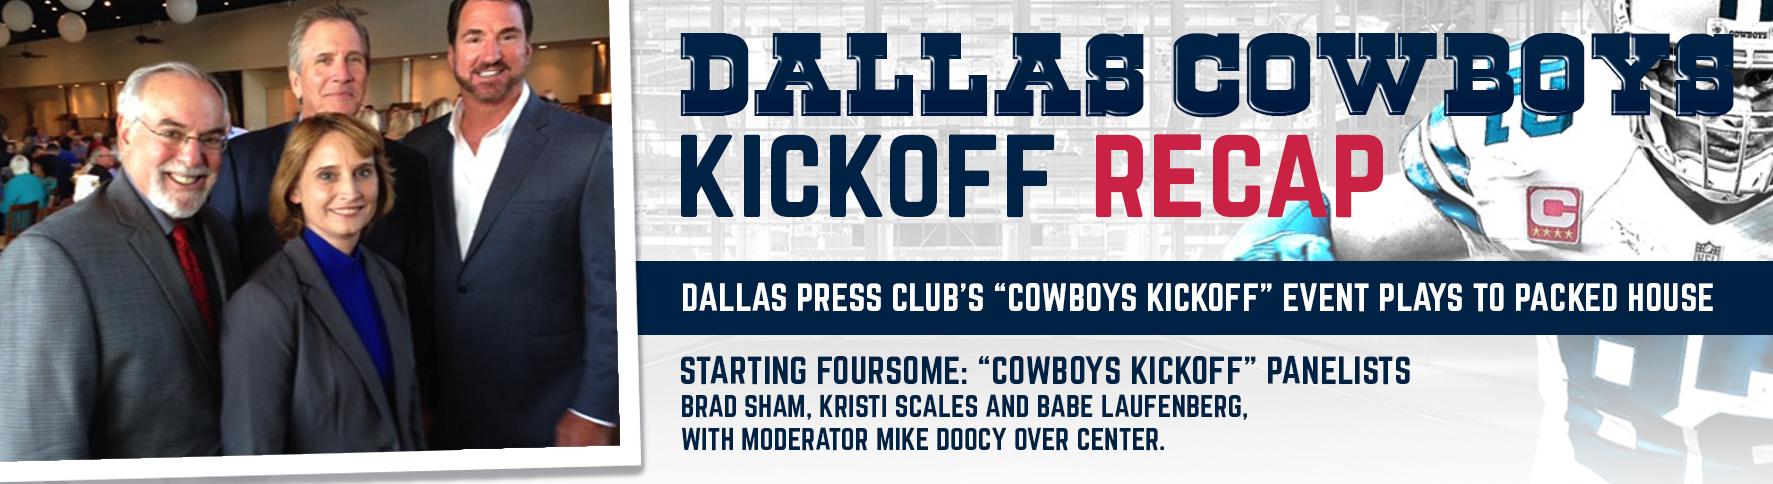 Dallas-Cowboys-Kickoff_slider_recap